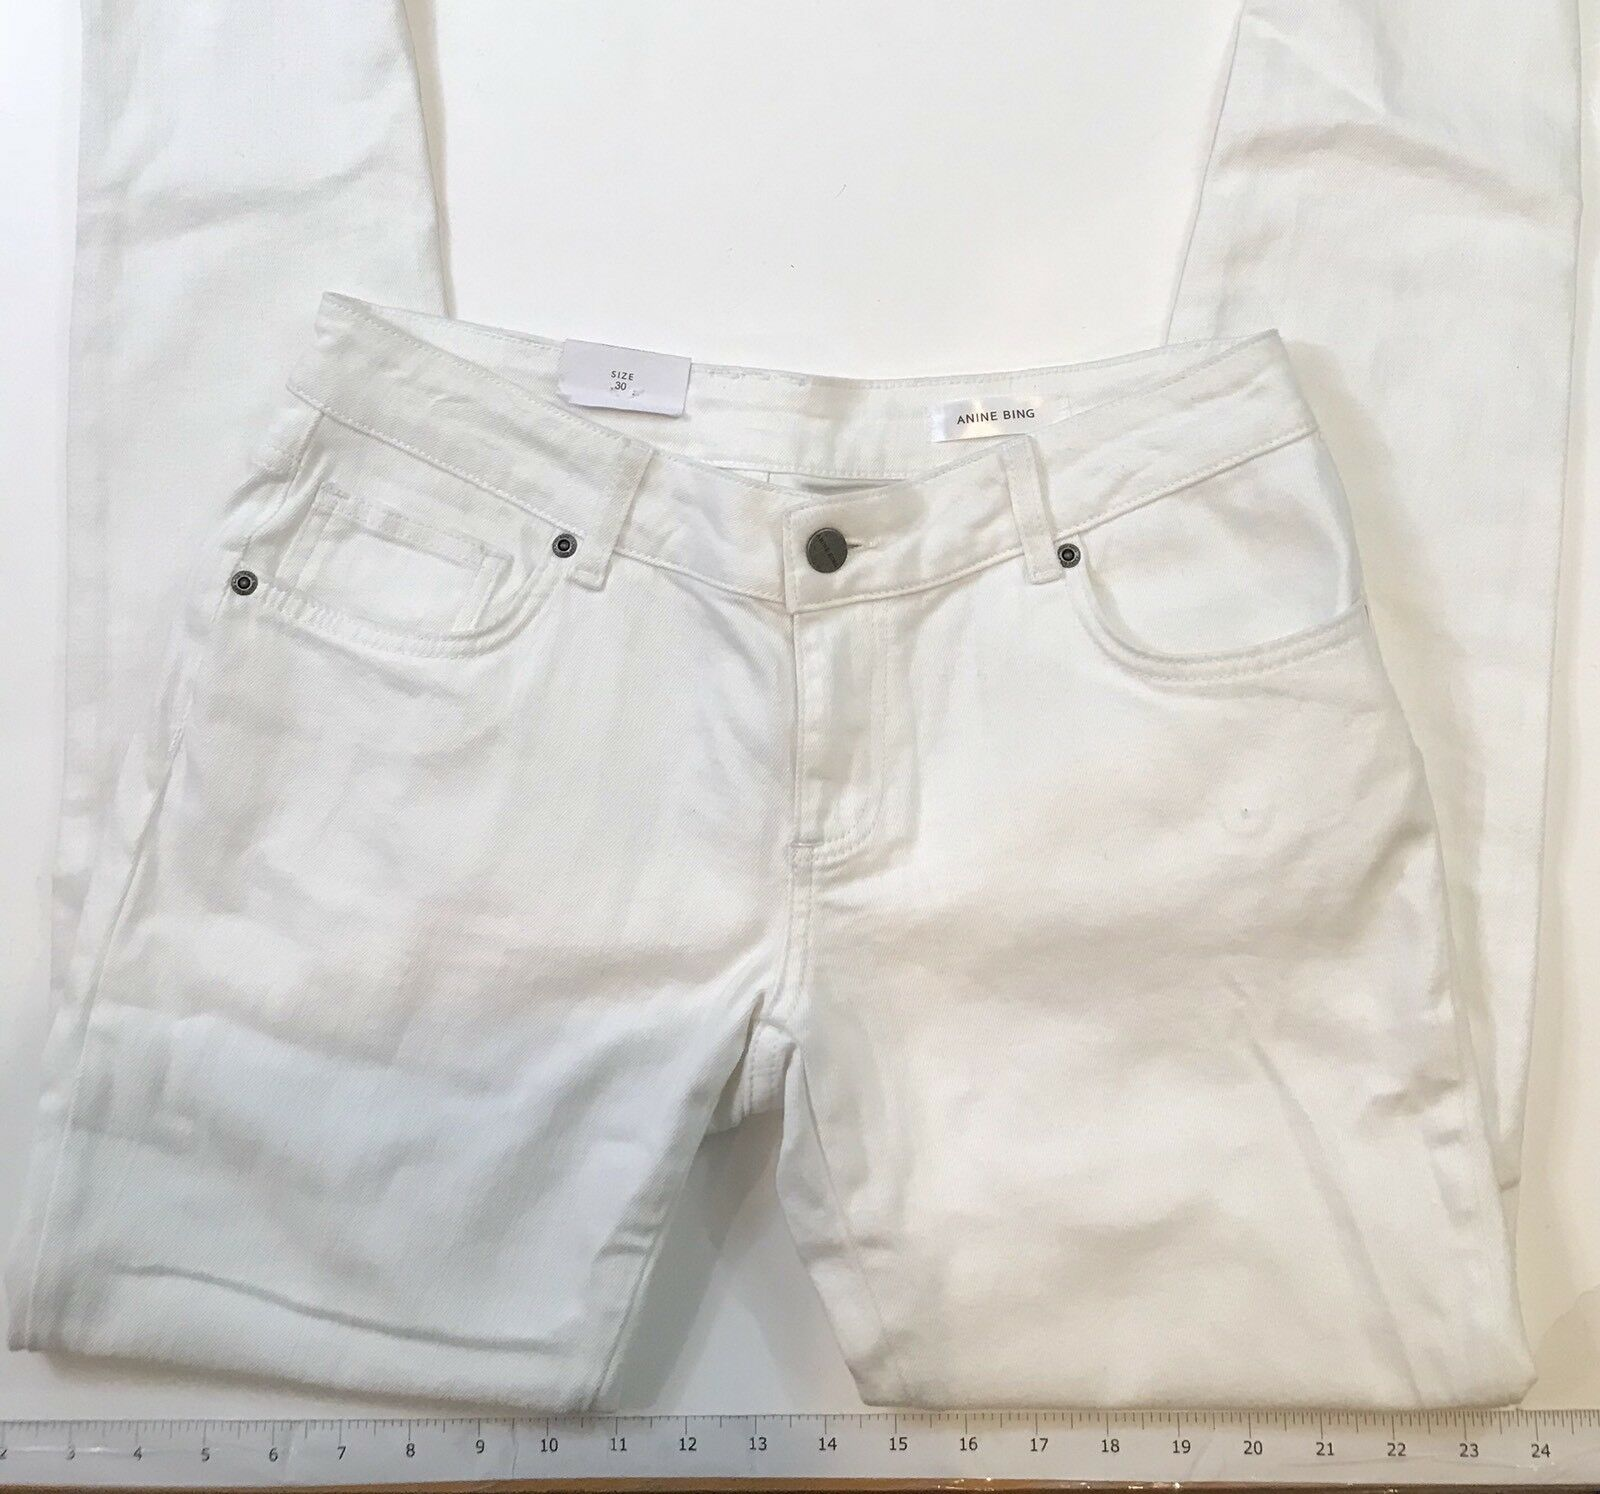 Brand New  Anine Bing  Destroyed Skinny Jean White Size 30